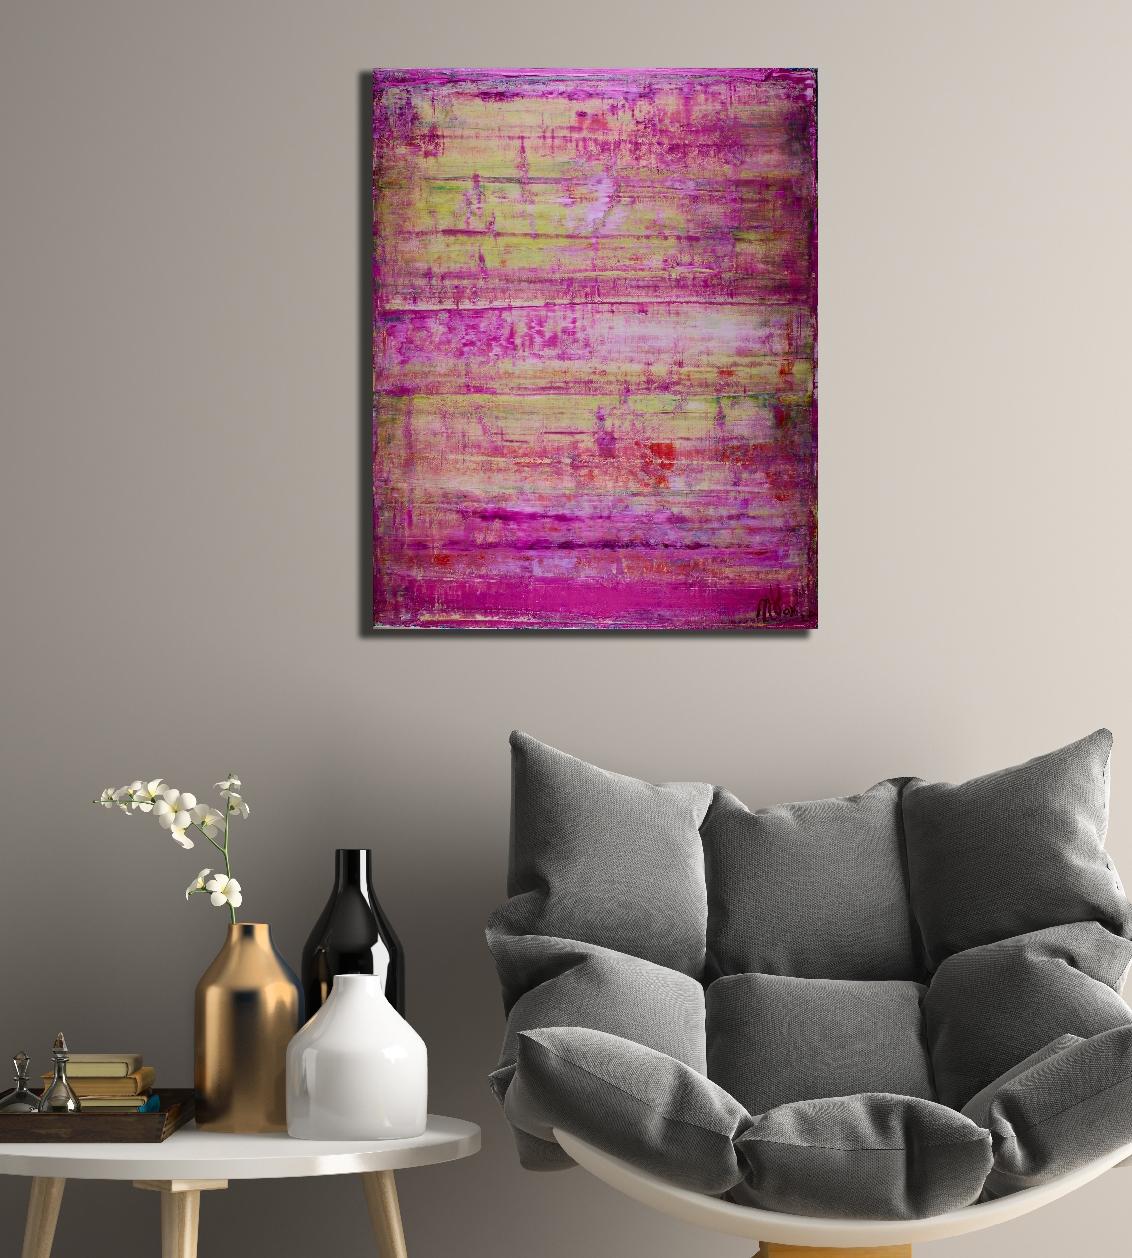 Purple Light by Nestor Toro (2018) abstract art Acrylic painting by Nestor Toro